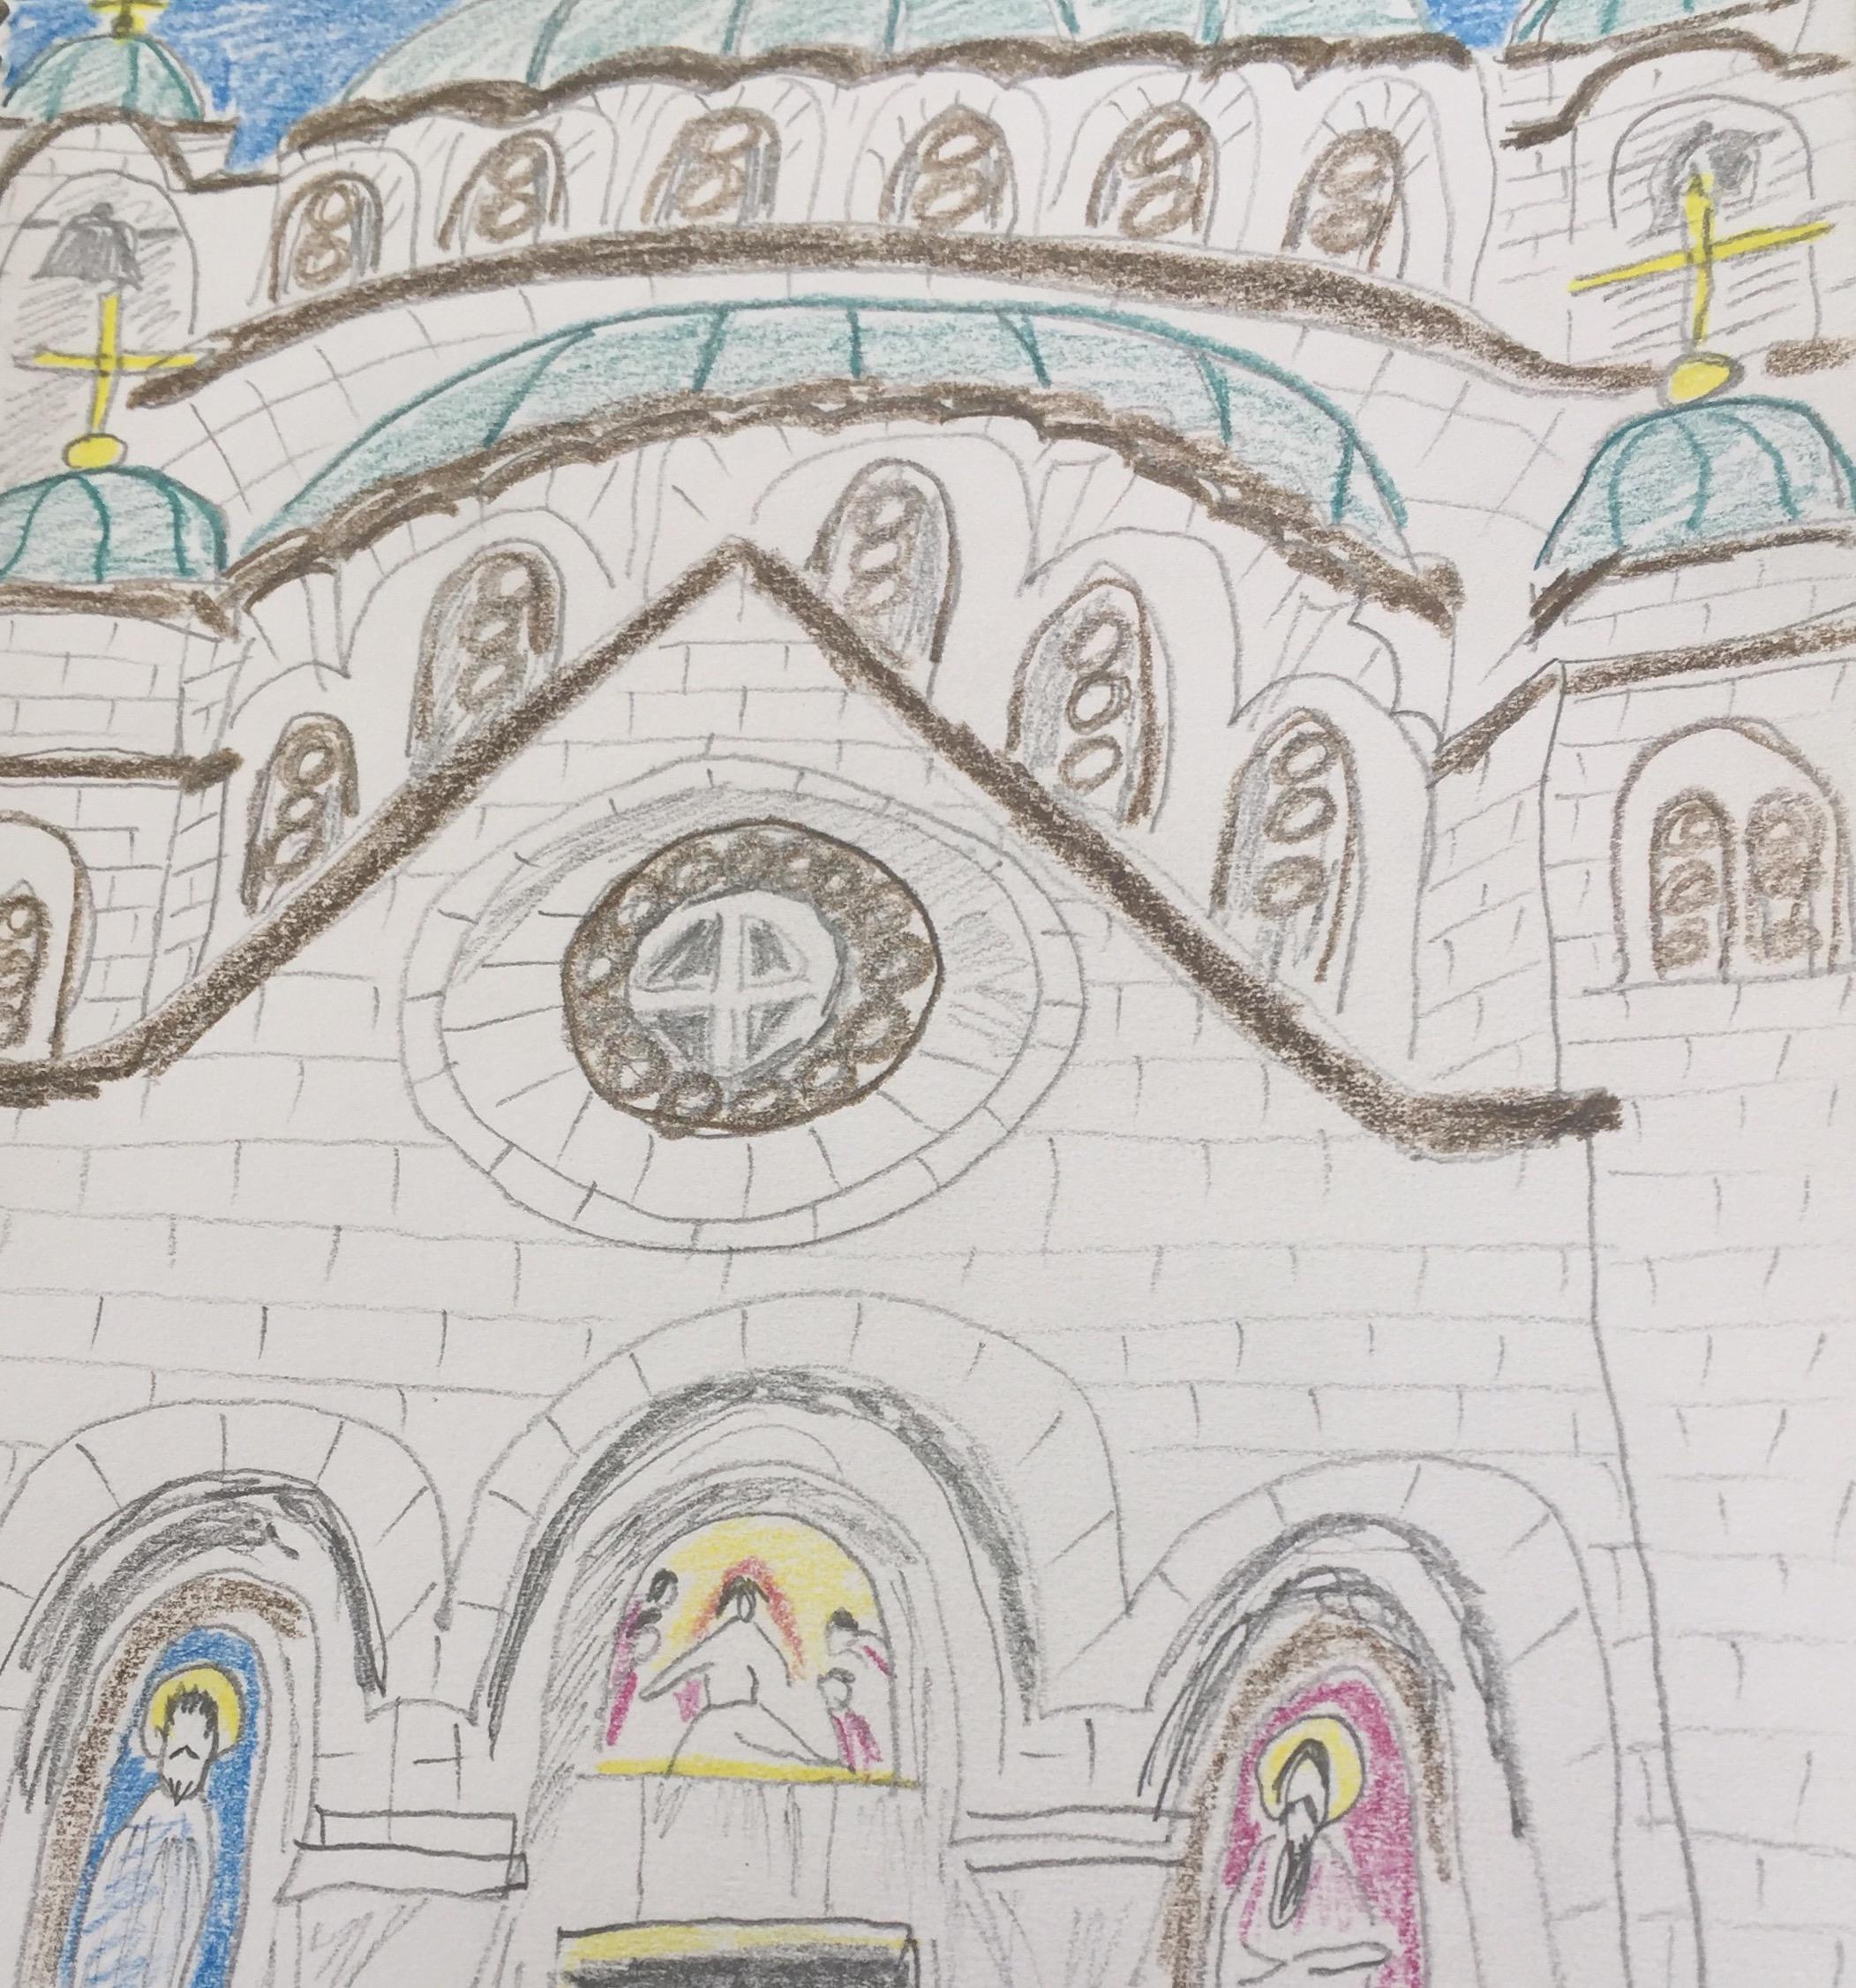 The Hram